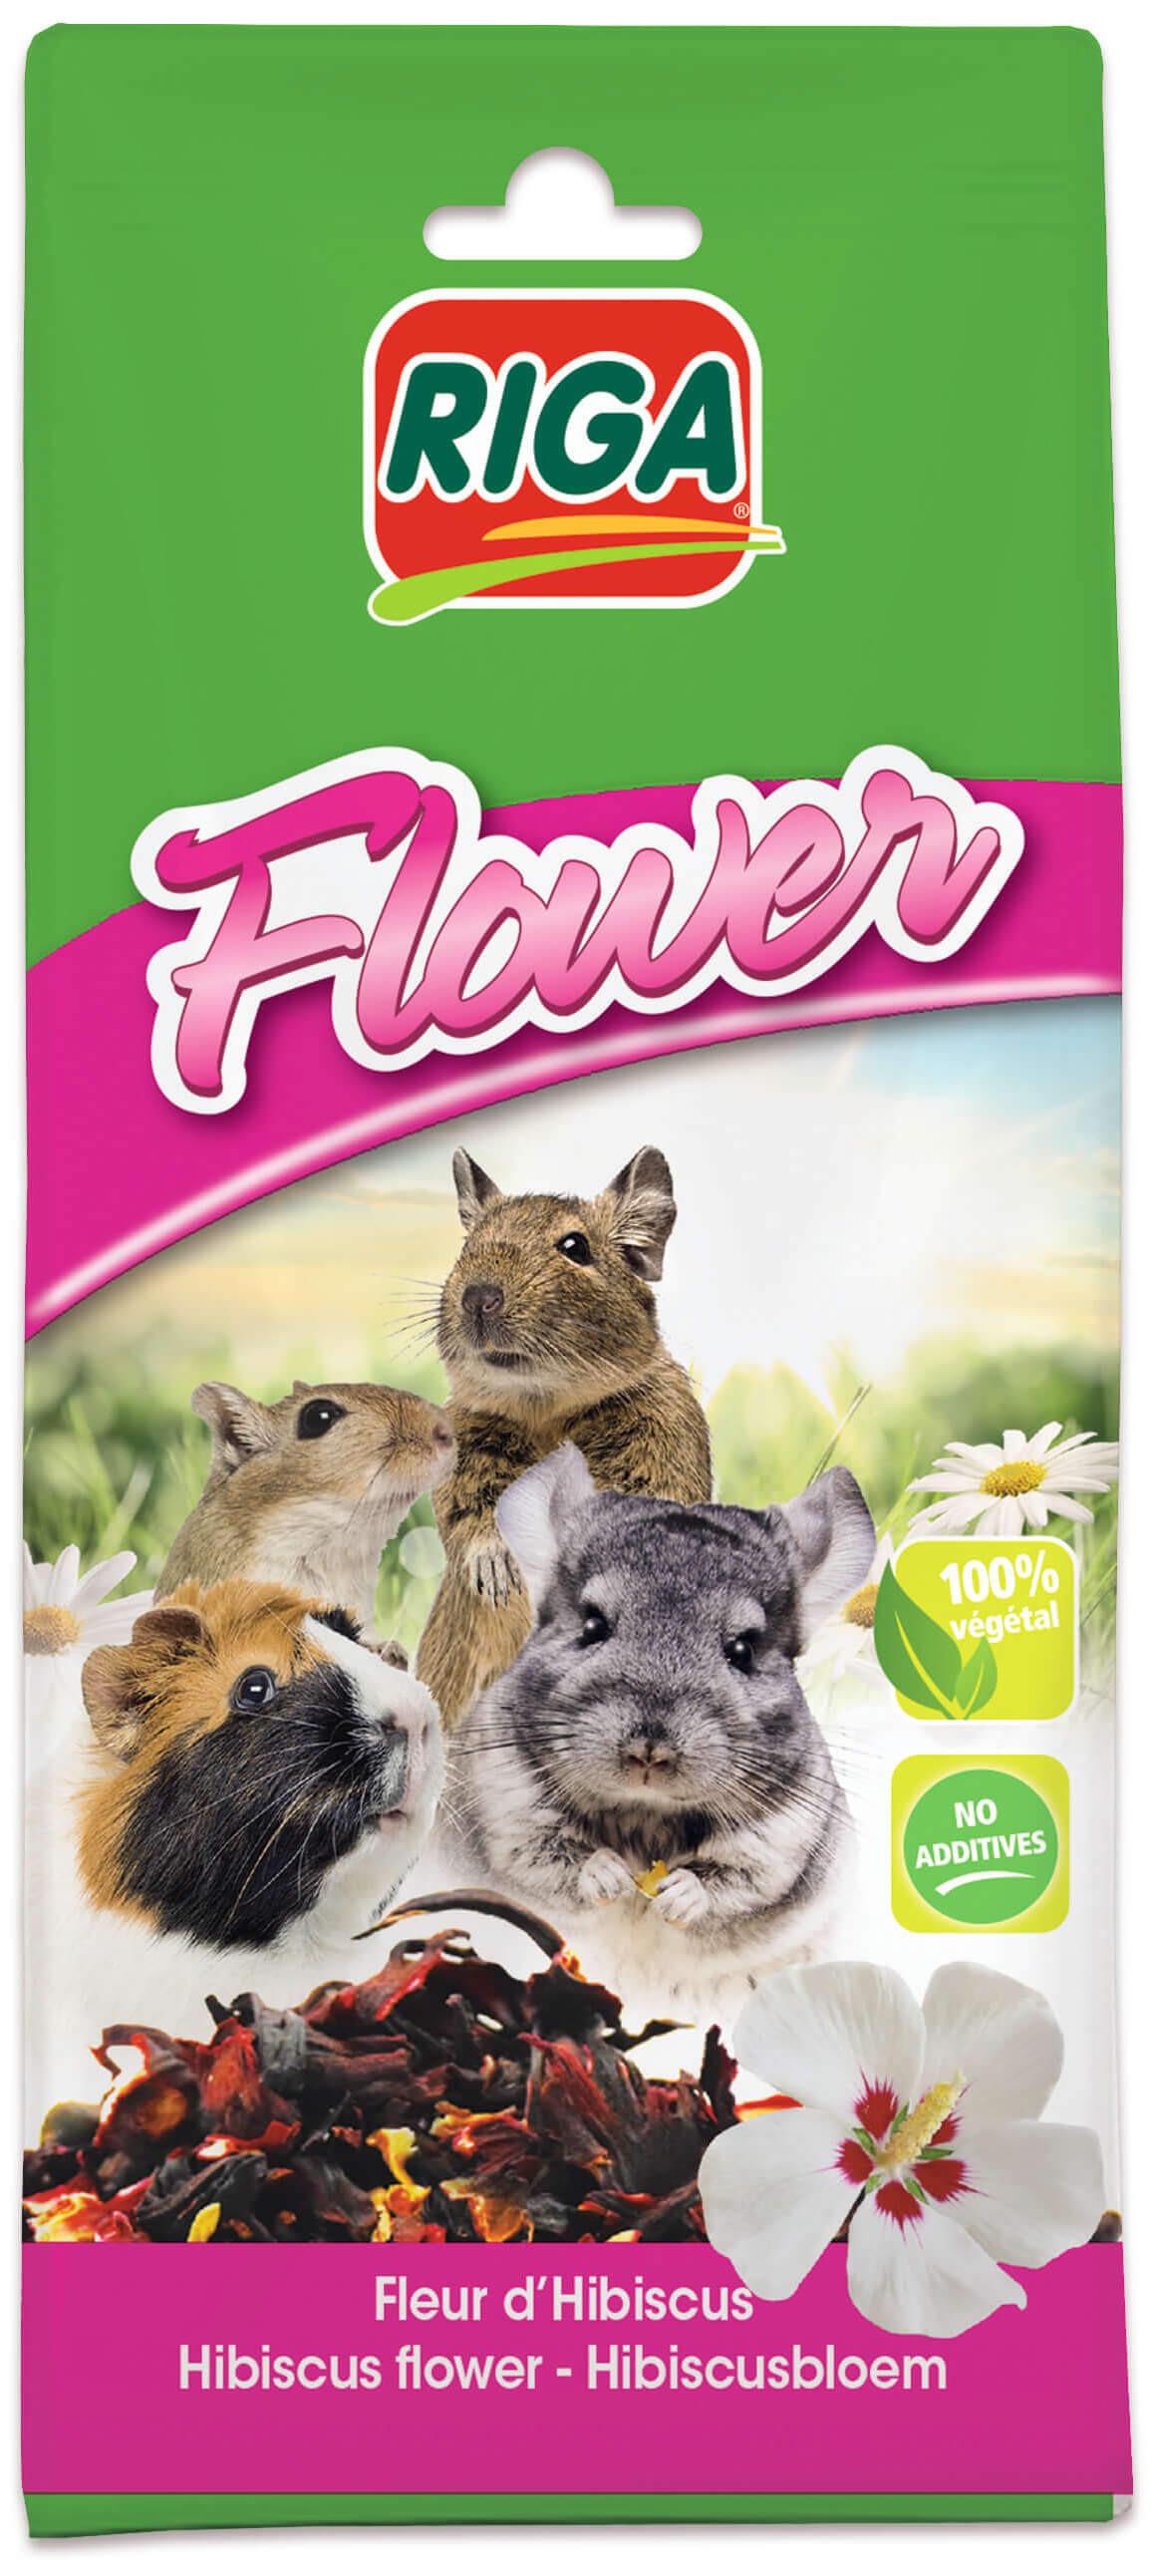 Flower, 100% fleurs d'hibiscus